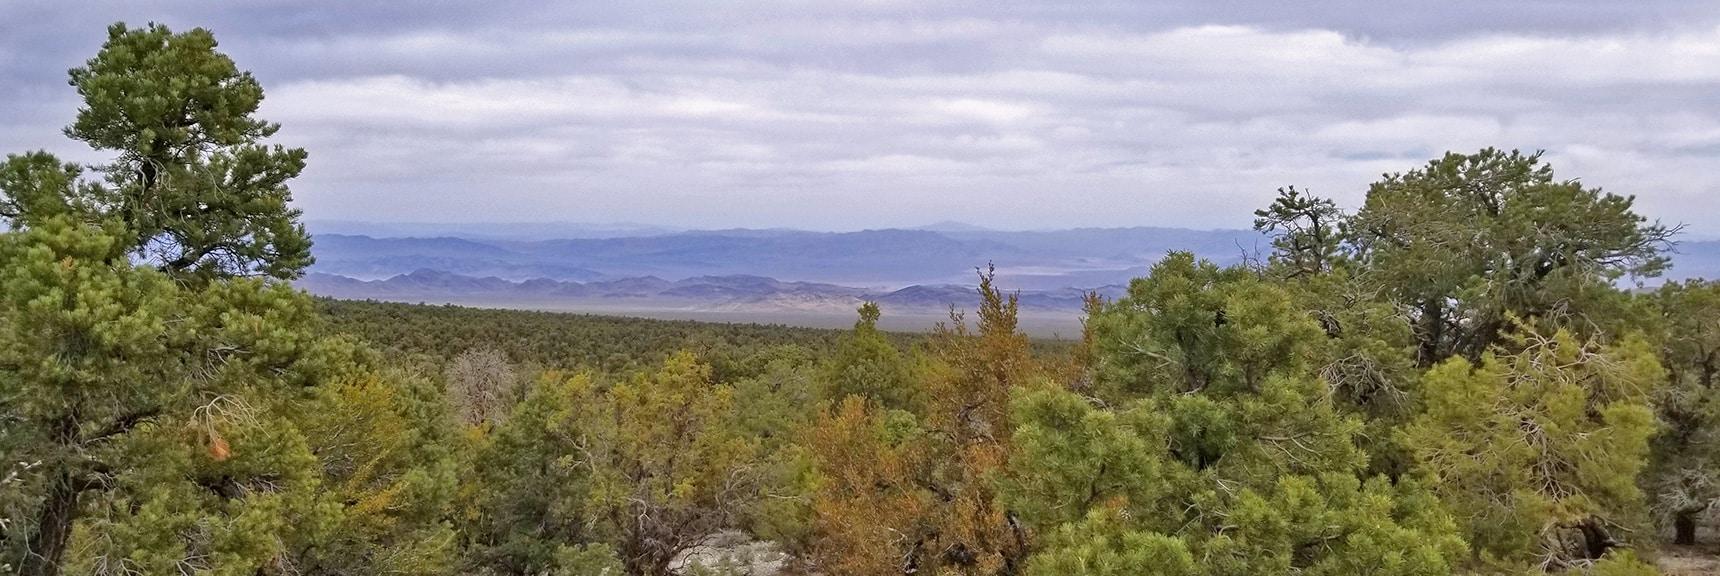 Beautiful Desert Valley Hwy 95 Corridor Below to the Northeast   Sawmill Trail to McFarland Peak   Spring Mountains, Nevada